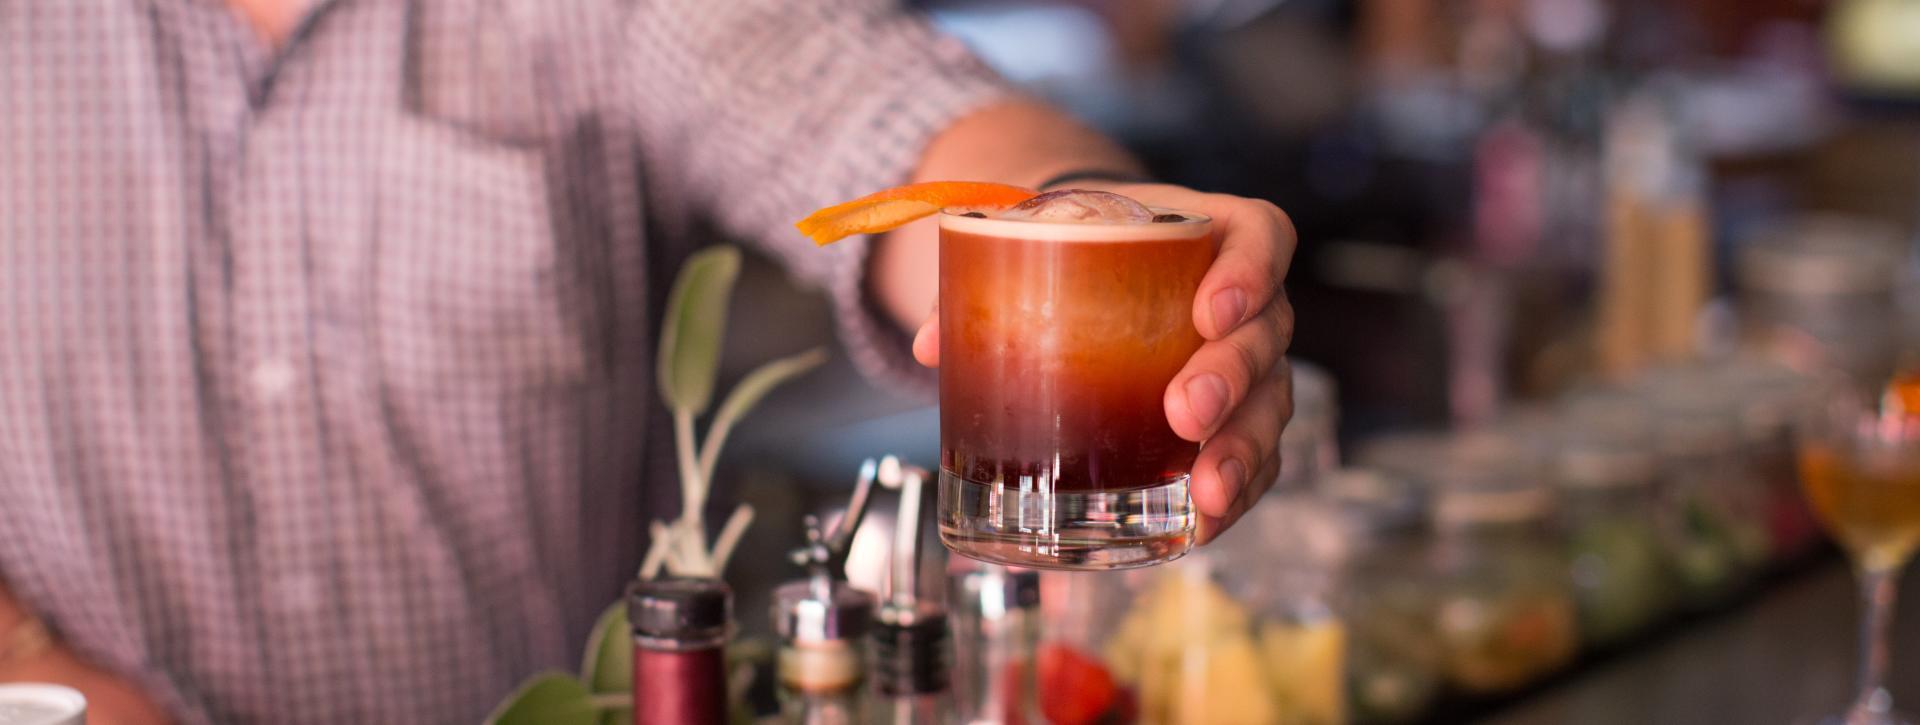 harrisburg-pa-cocktails-rubicon